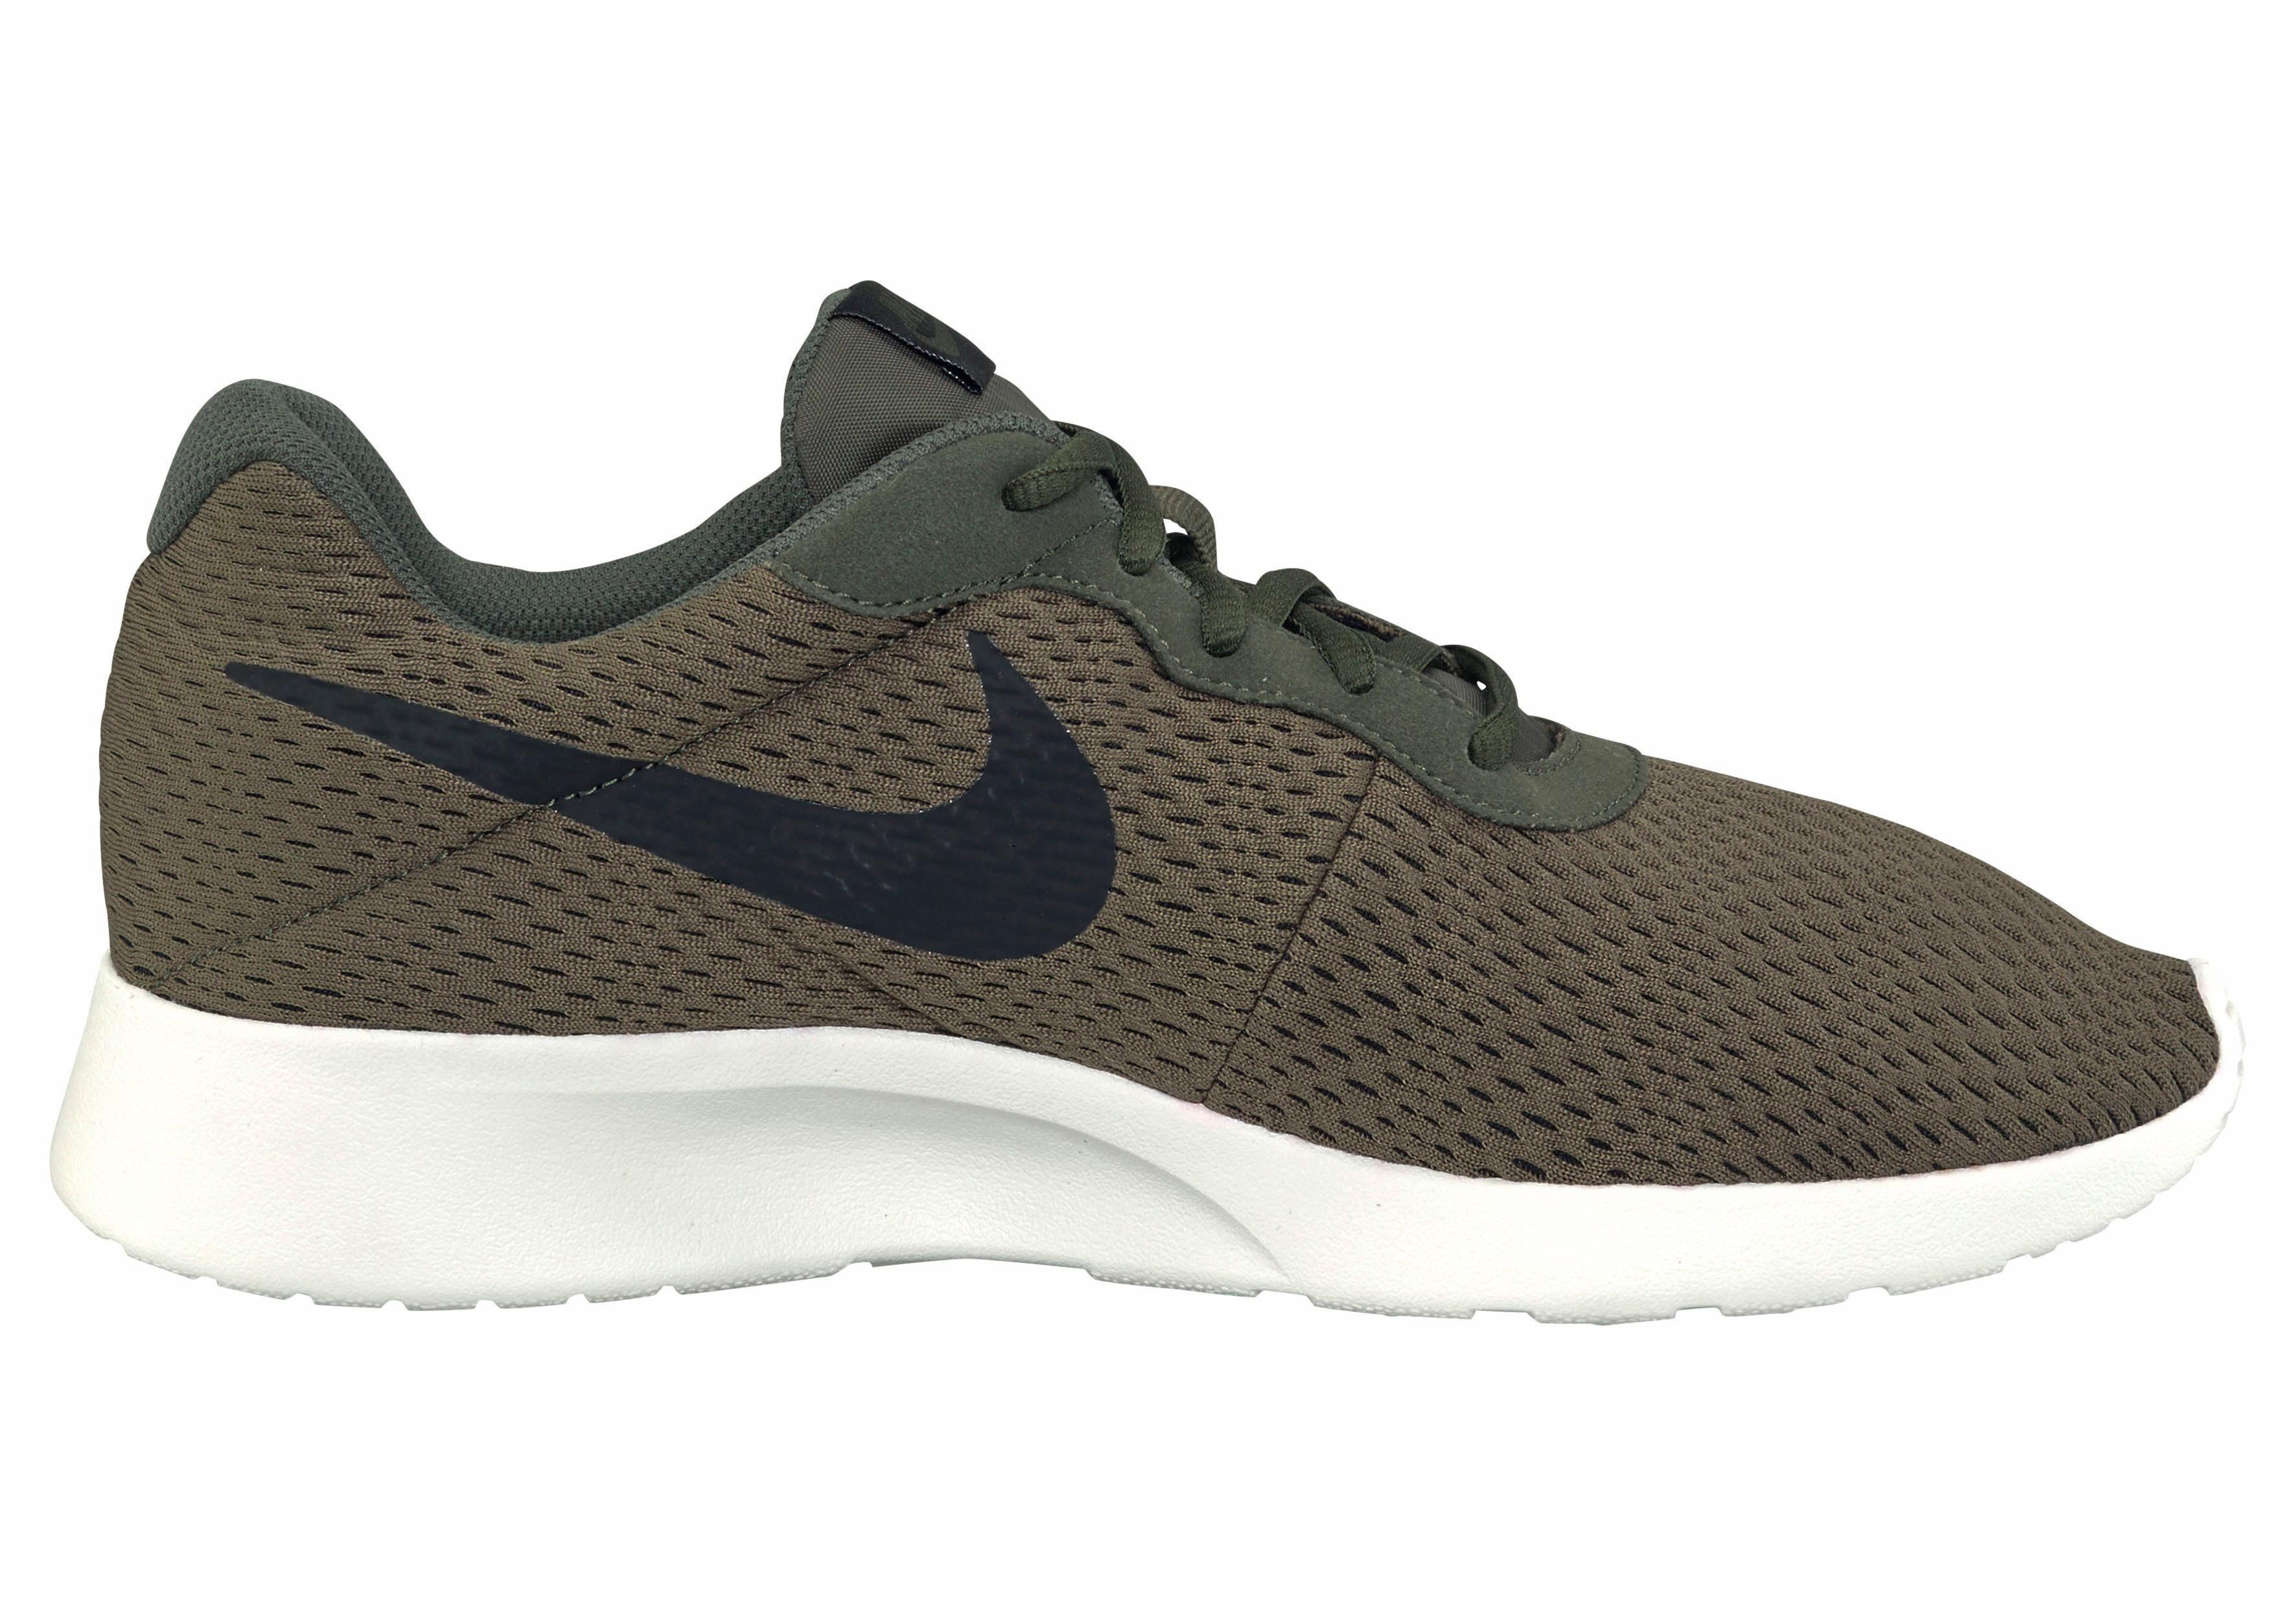 Tanjun Chaussures Vert Nike Pour Les Hommes bgo8r8yzC